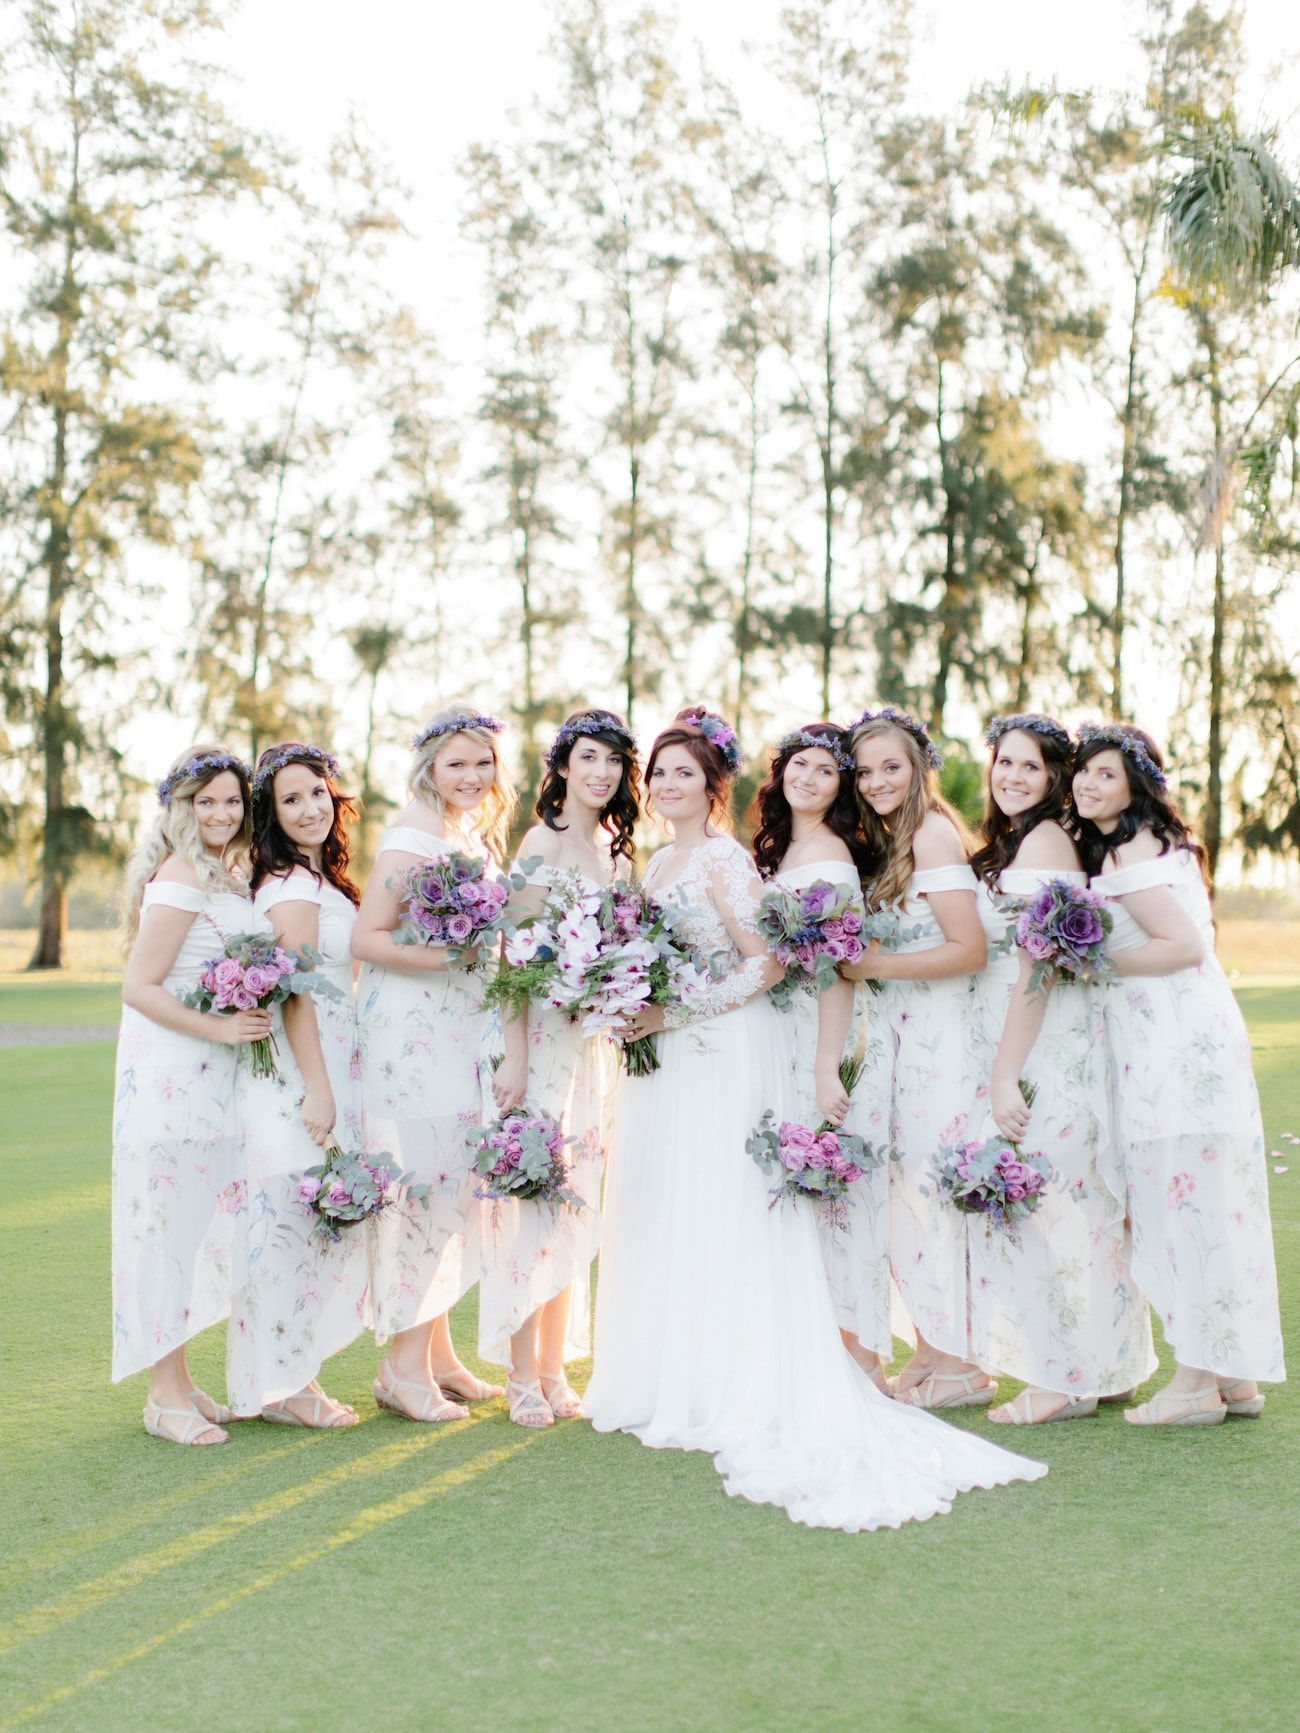 Romantic Pastel Farm Wedding by Rensche Mari   SouthBound Bride